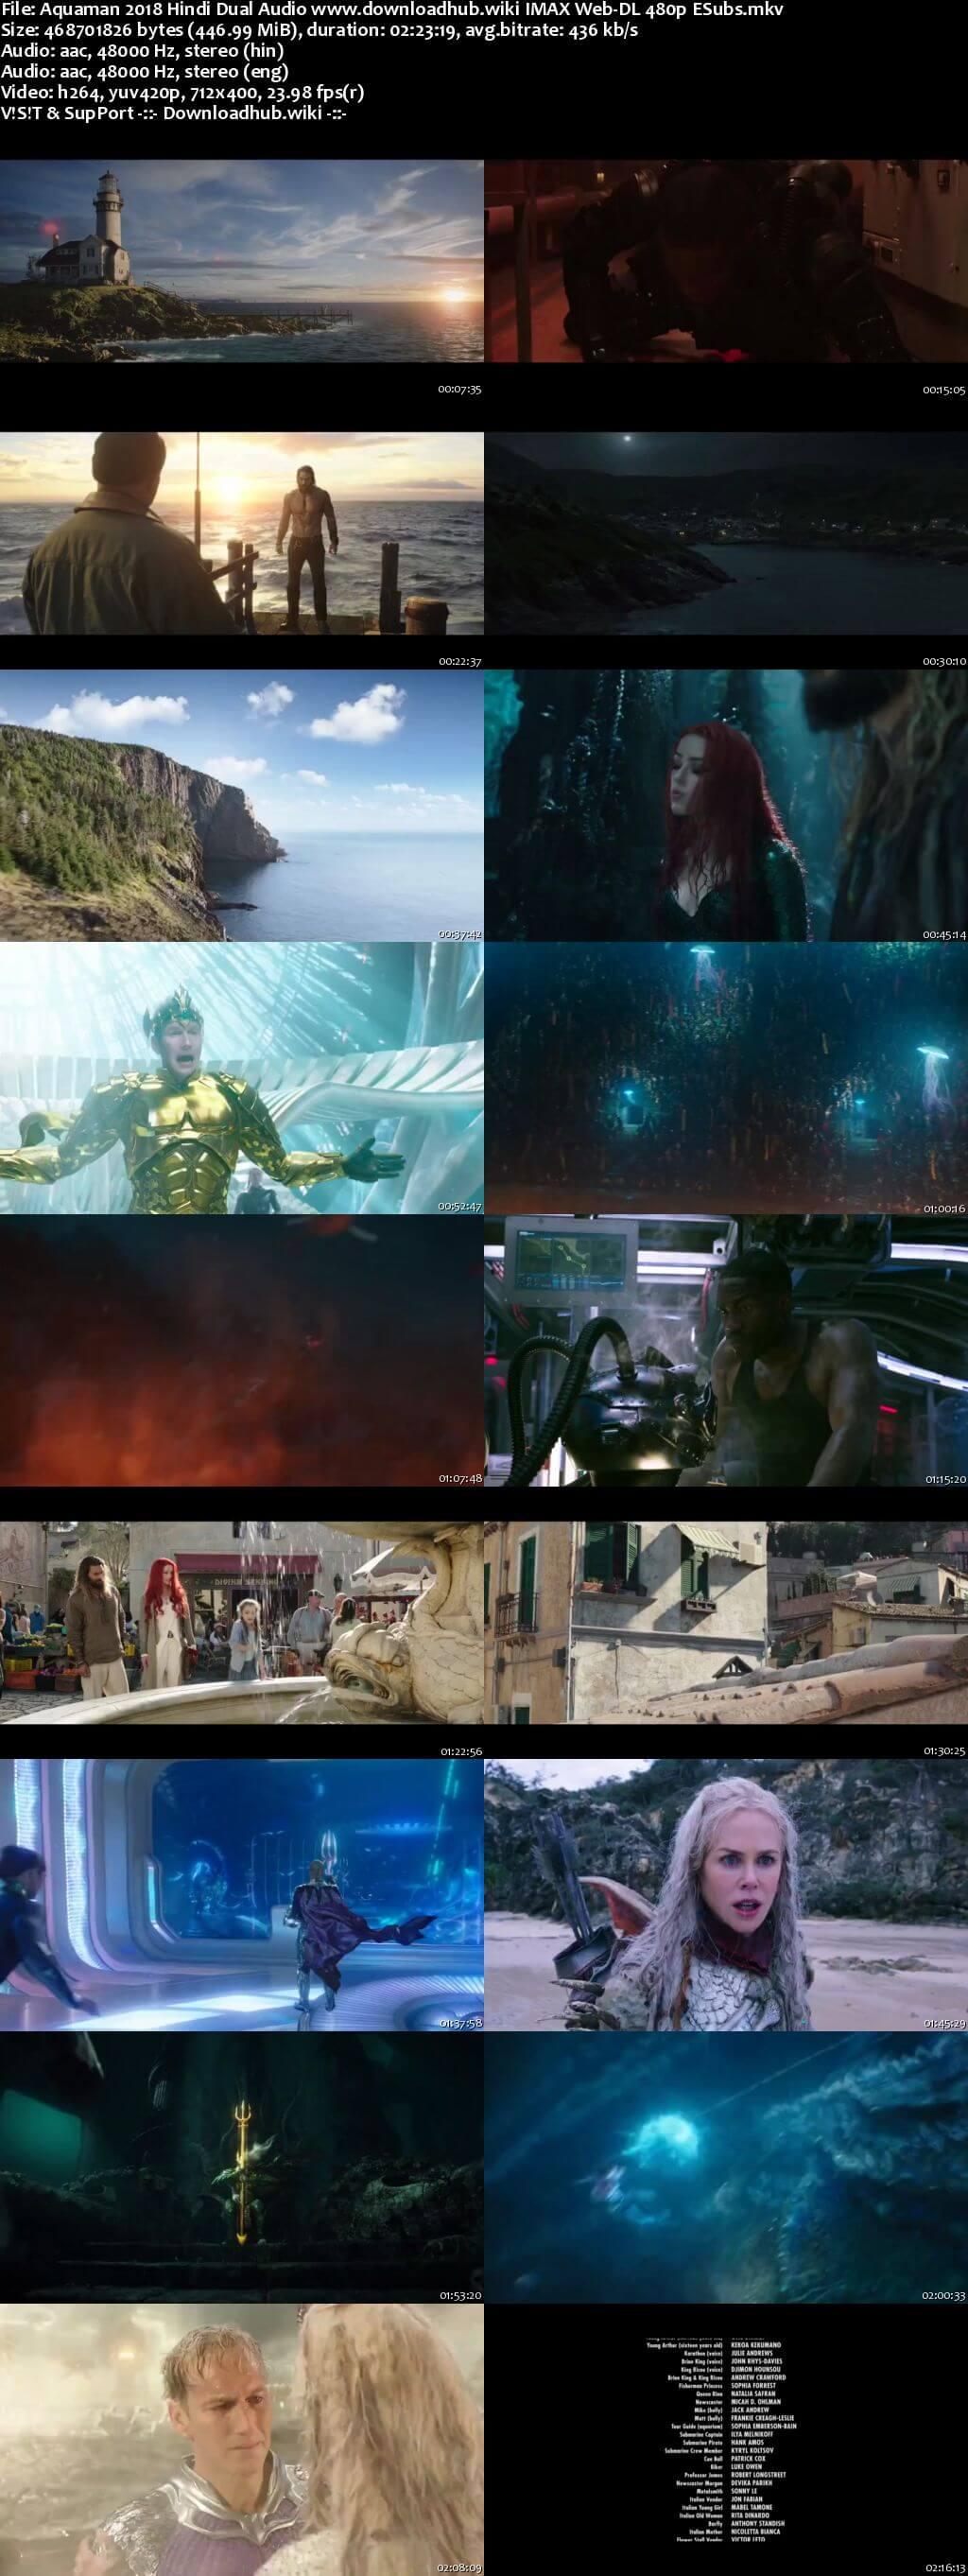 Aquaman 2018 Hindi Dual Audio 450MB IMAX Web-DL 480p ESubs